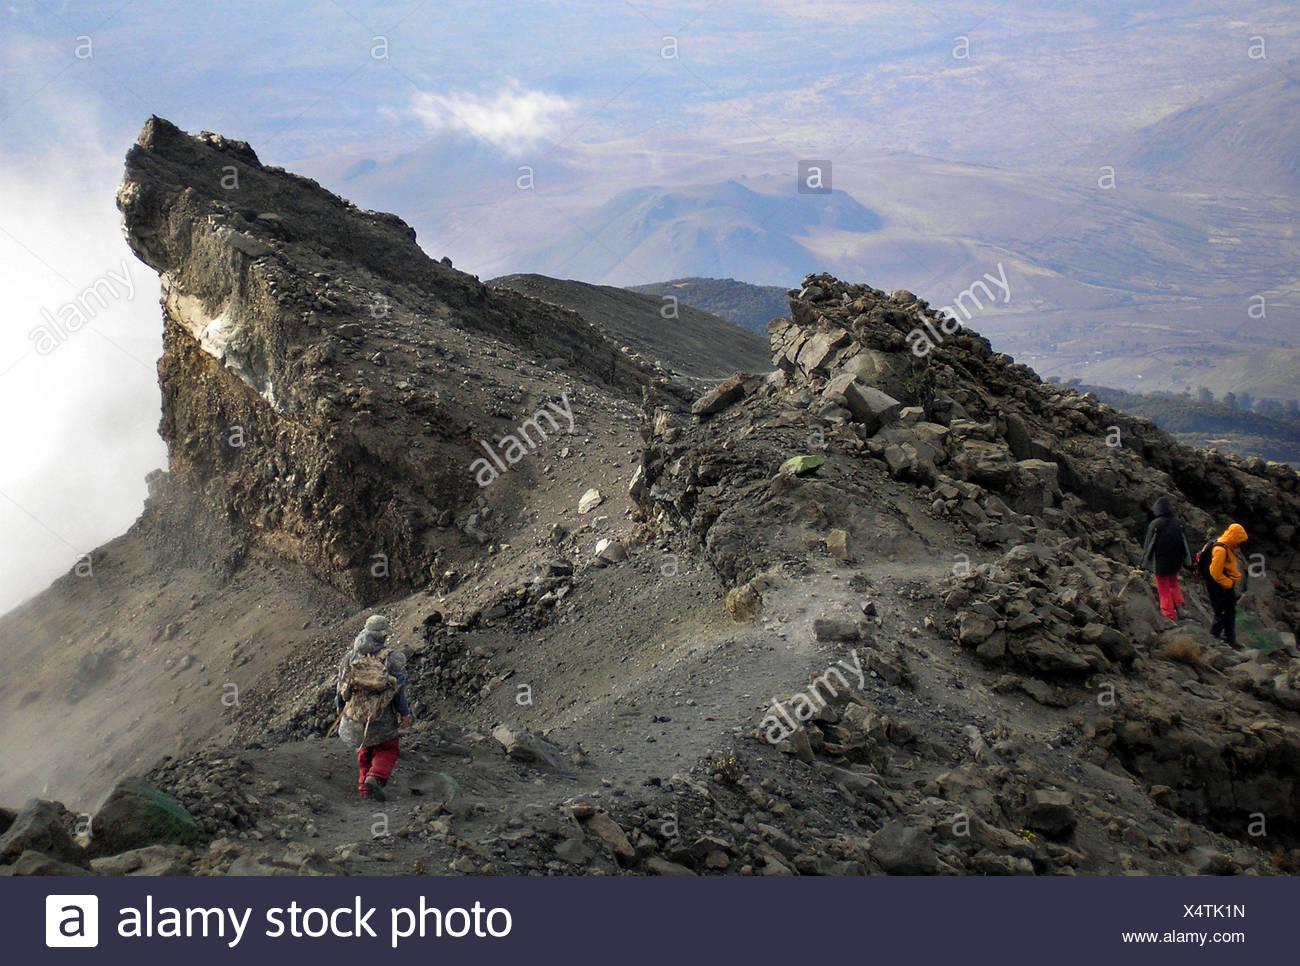 Mt Meru Tanzania Africa - Stock Image